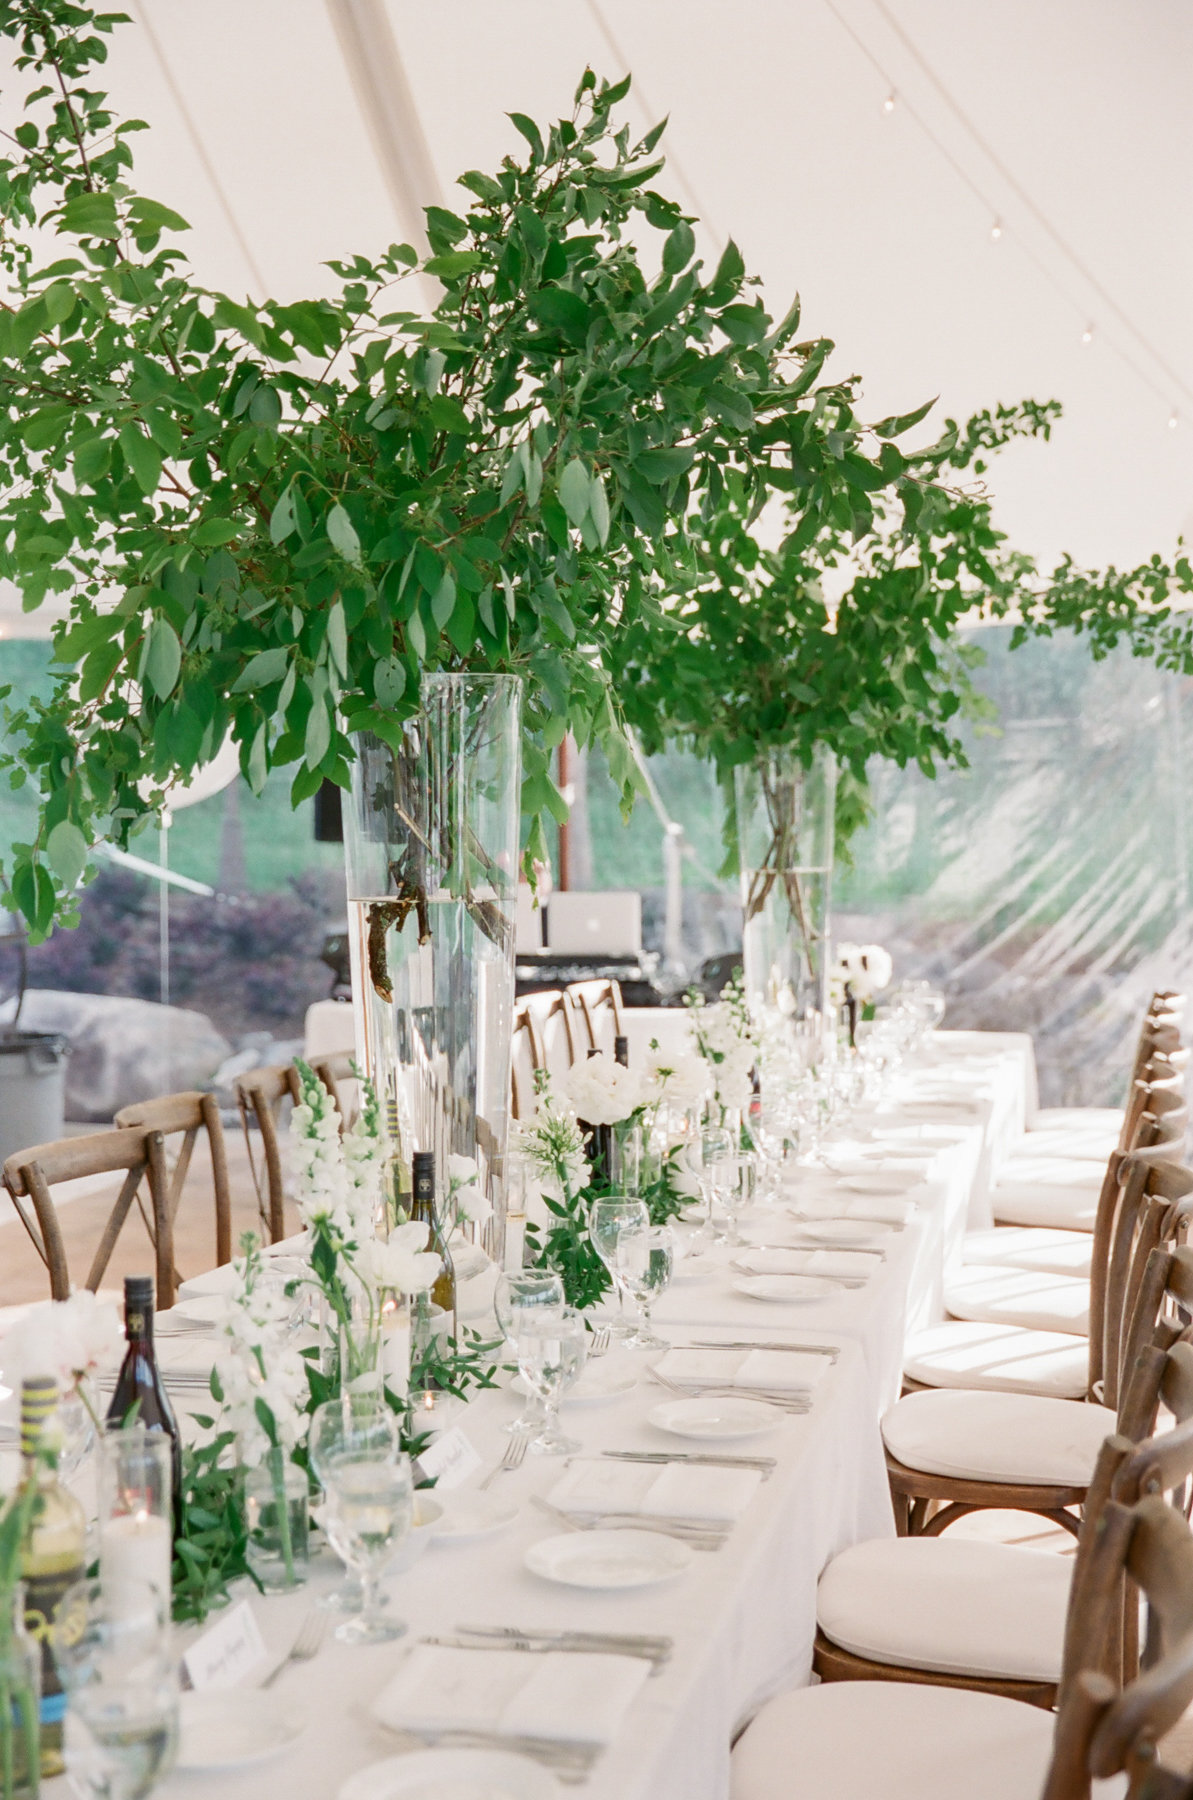 0808-maggiebrett-private-estate-wedding-000006320018.jpg